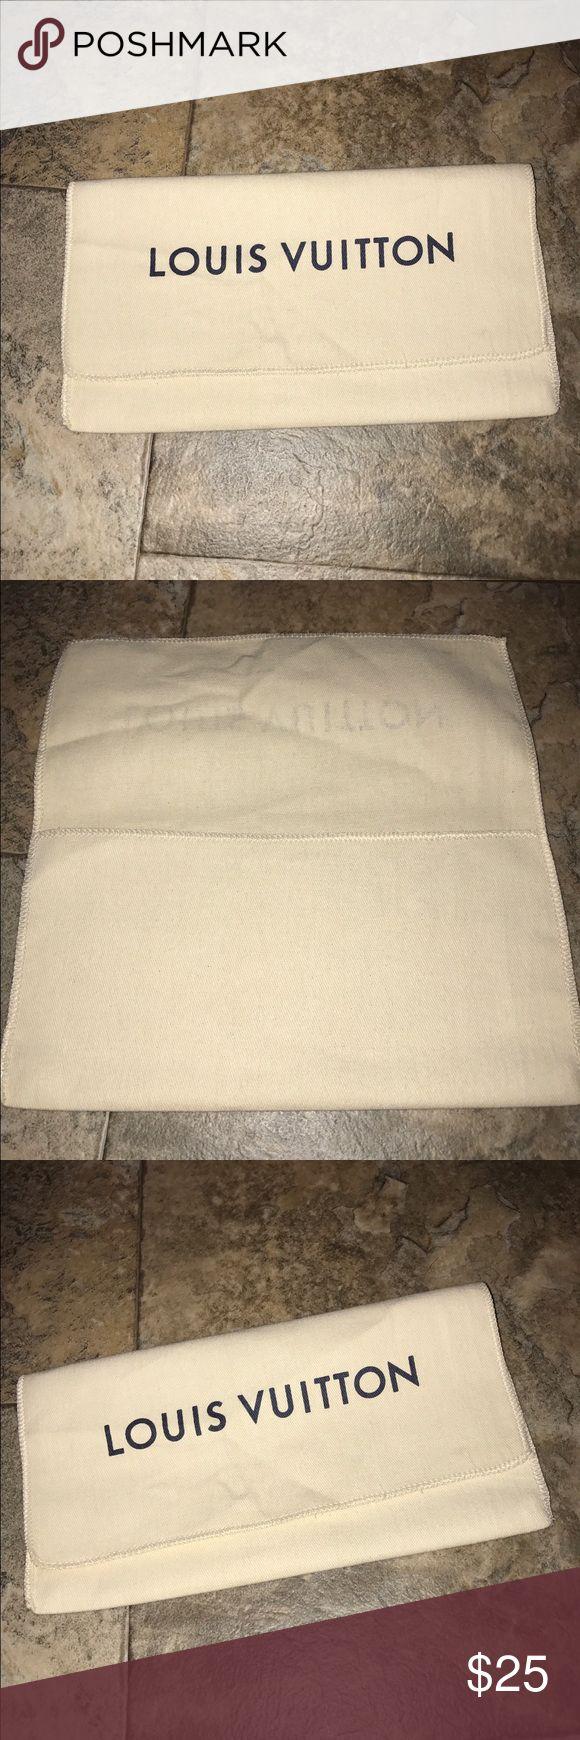 Louis Vuitton wallet dust bag new ! Louis Vuitton wallet dust bag new !  9 by 5 inches Louis Vuitton Bags Cosmetic Bags & Cases